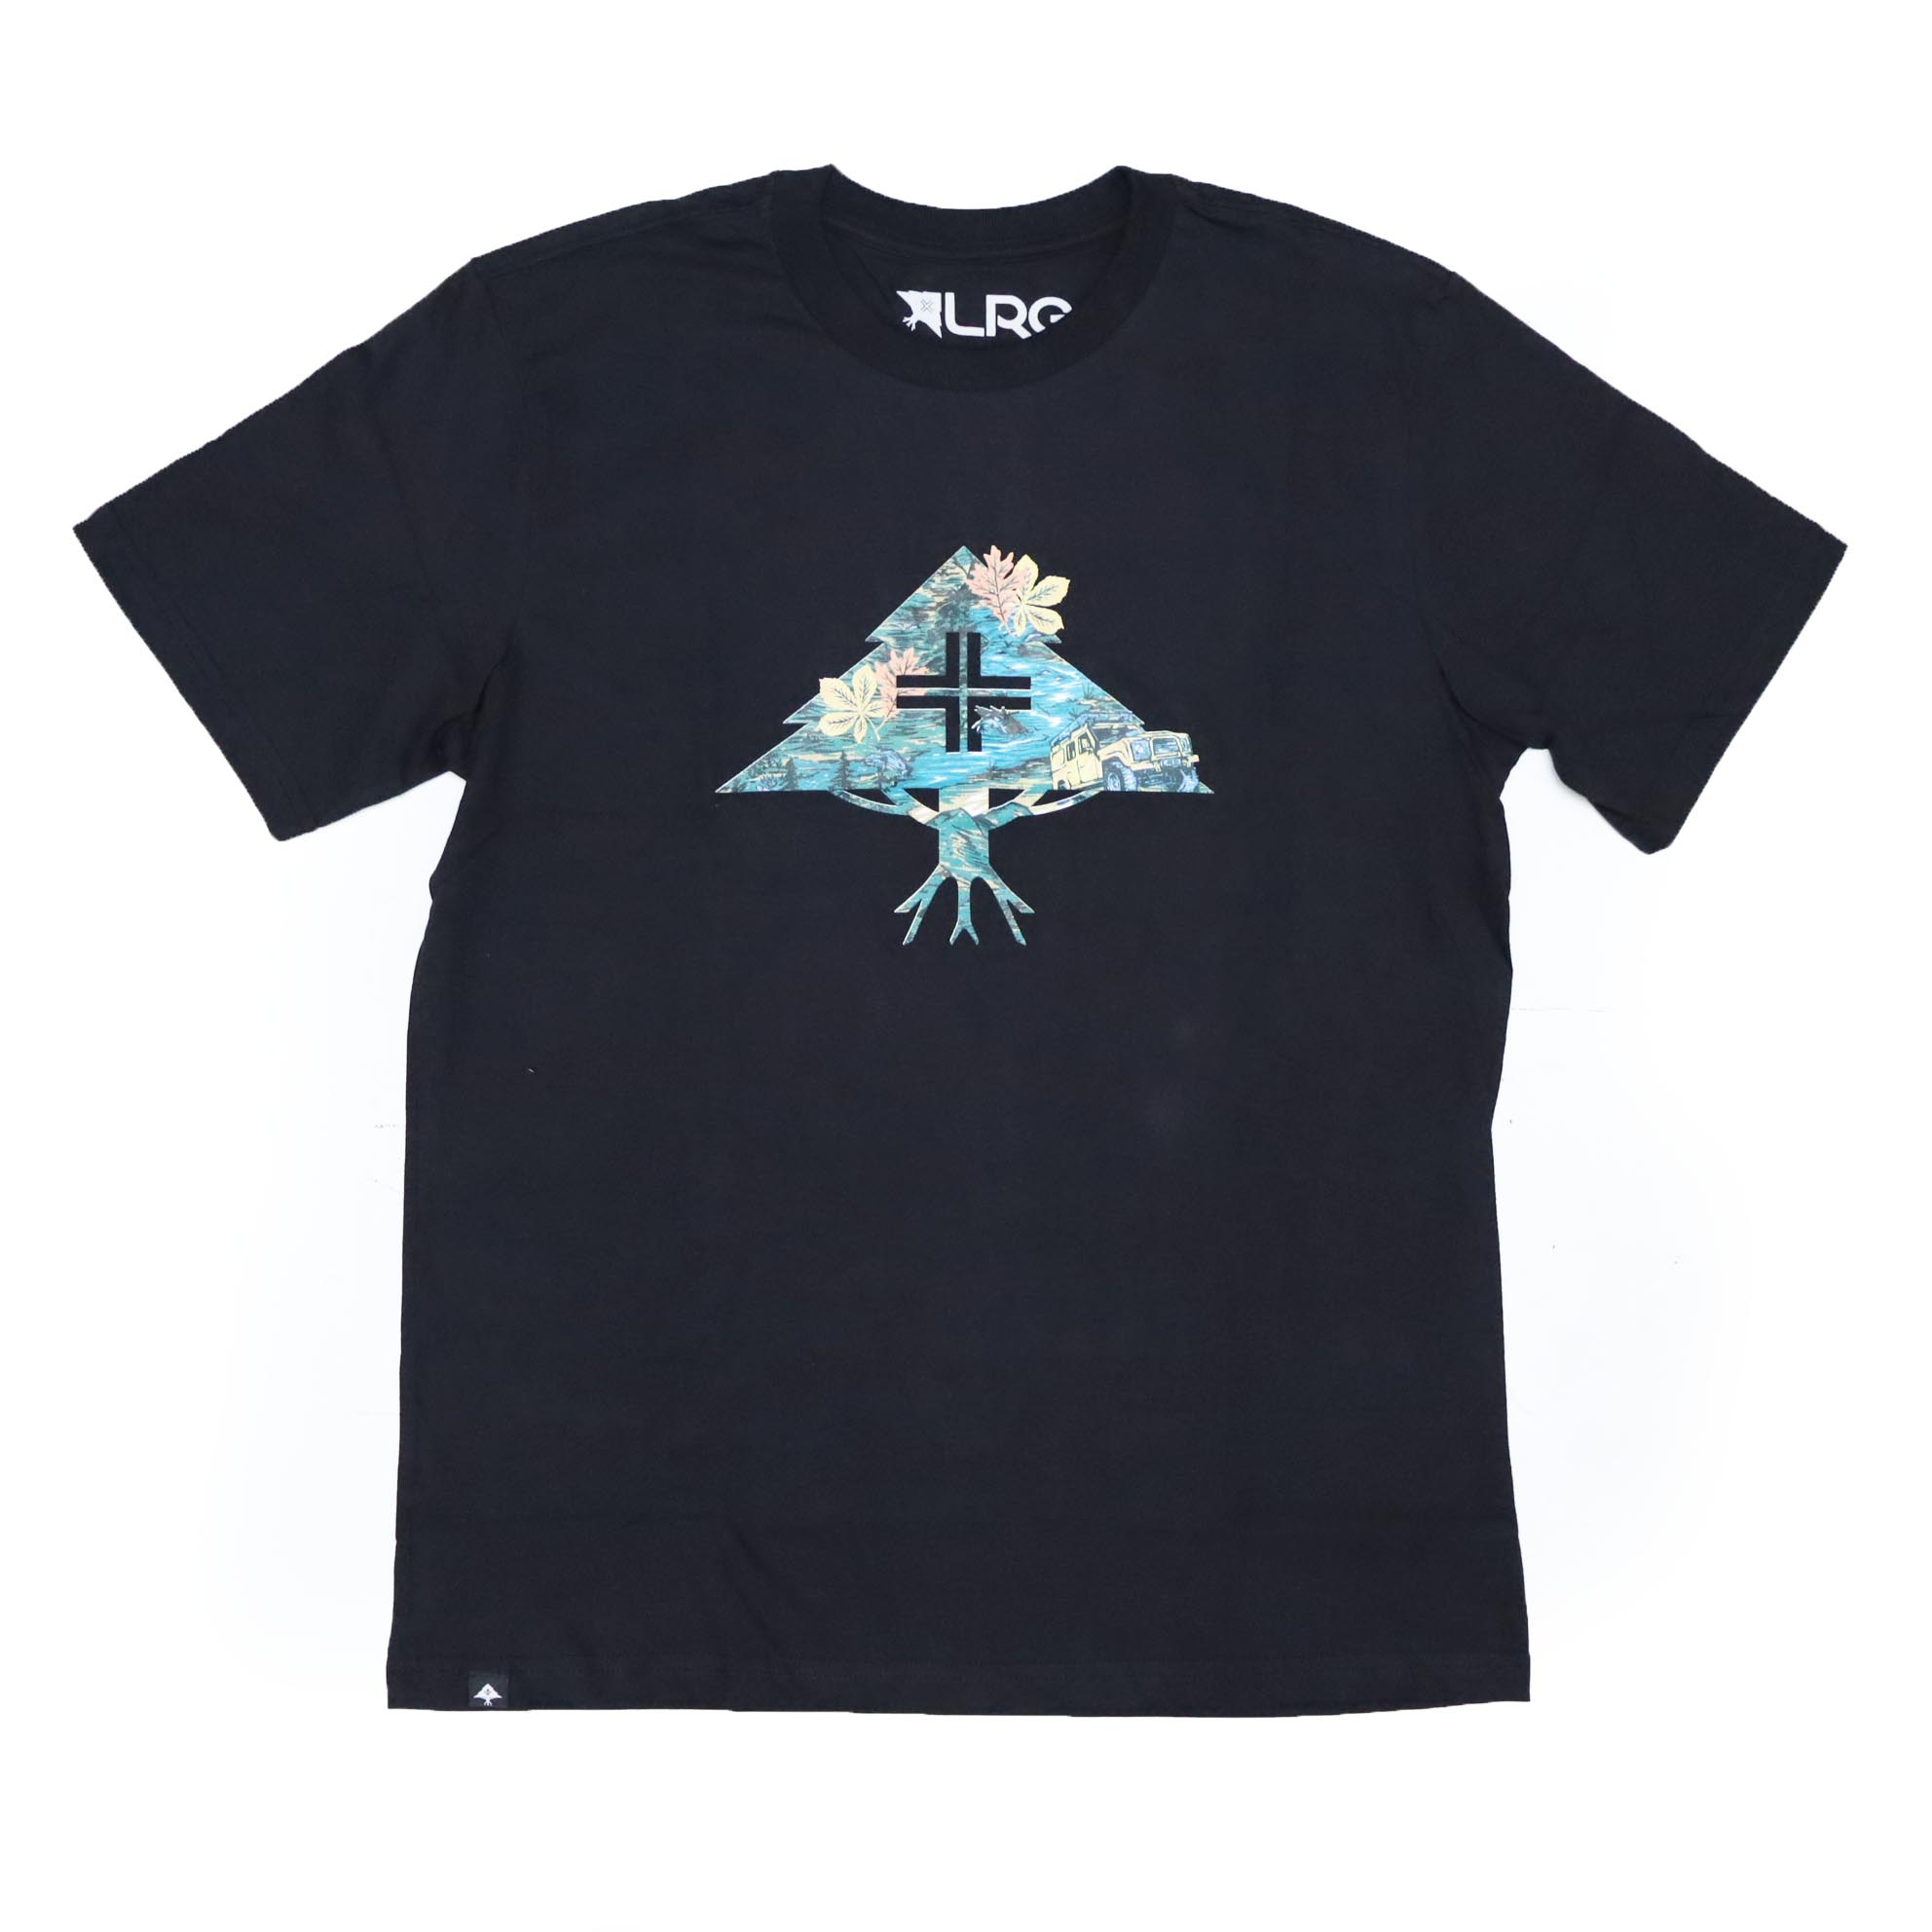 Camiseta LRG Research - Preto